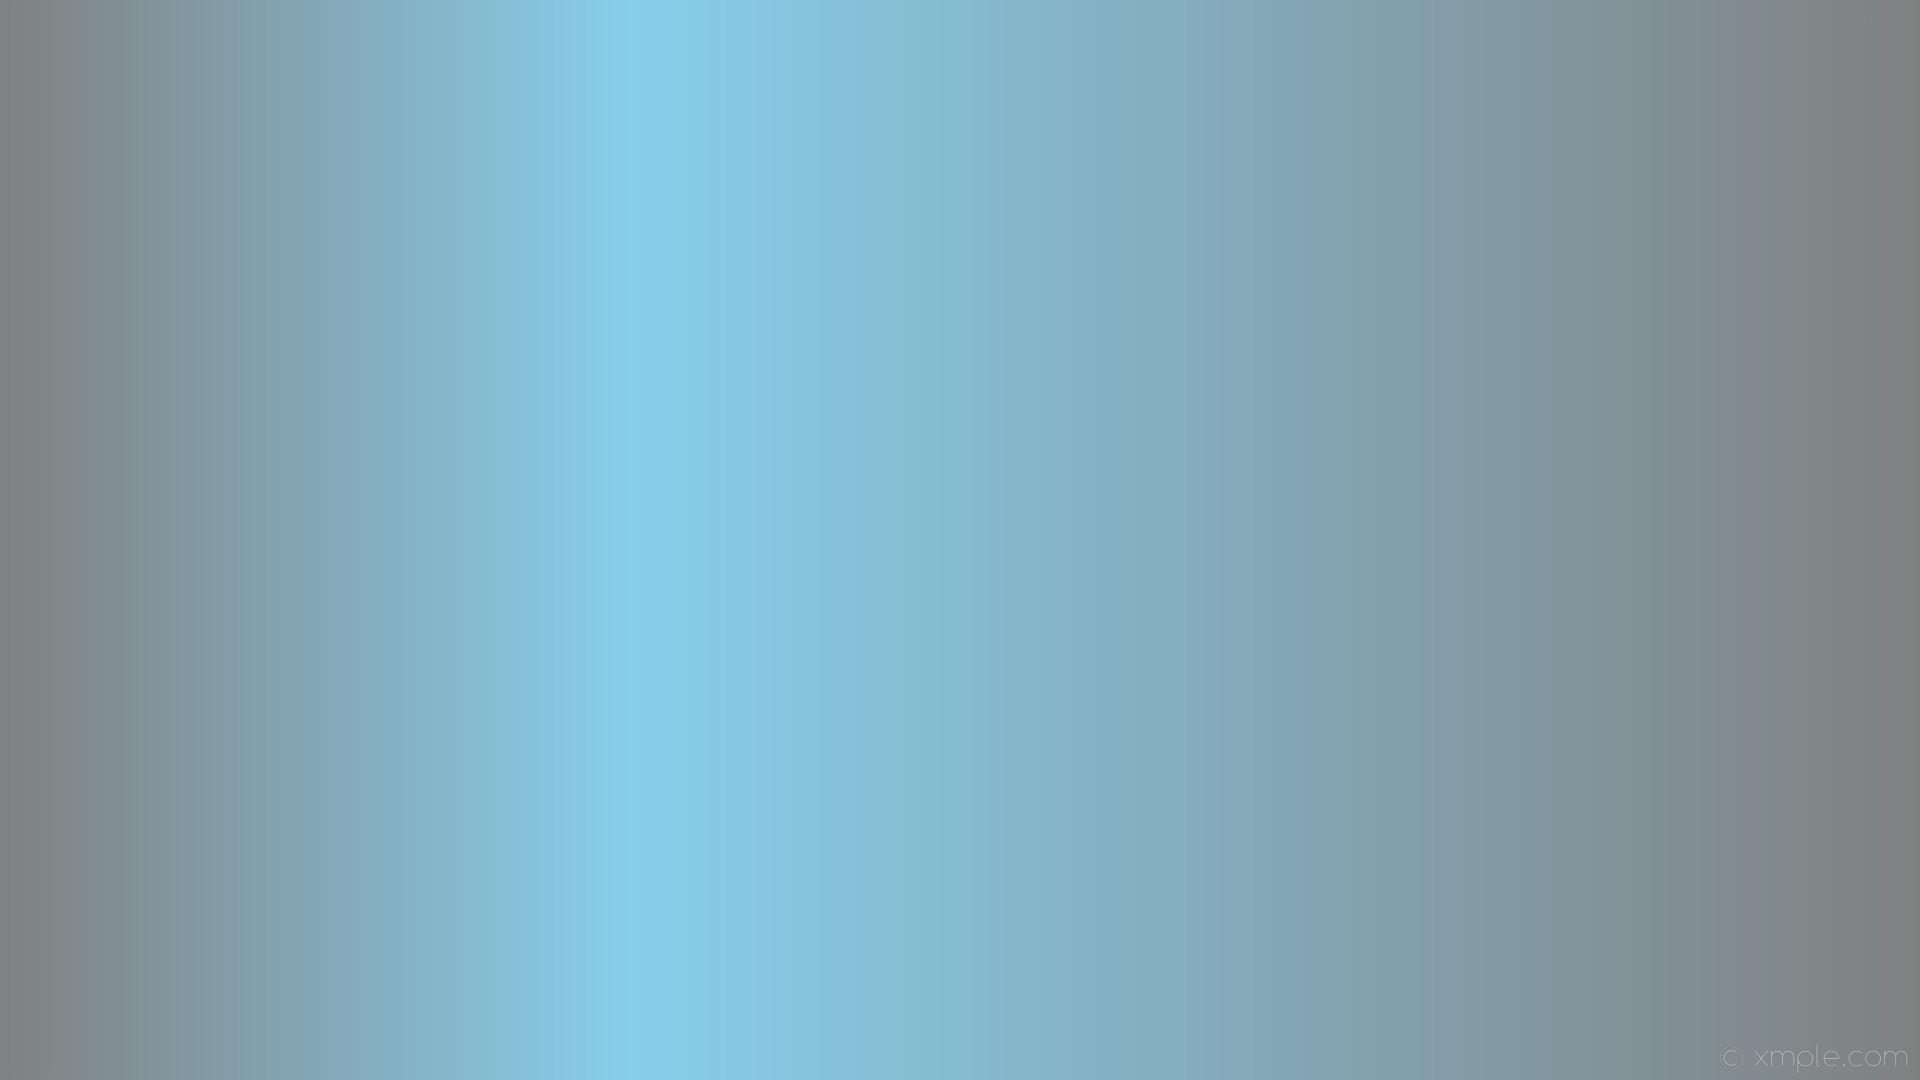 wallpaper linear highlight grey blue gradient gray sky blue #808080 #87ceeb  0° 67